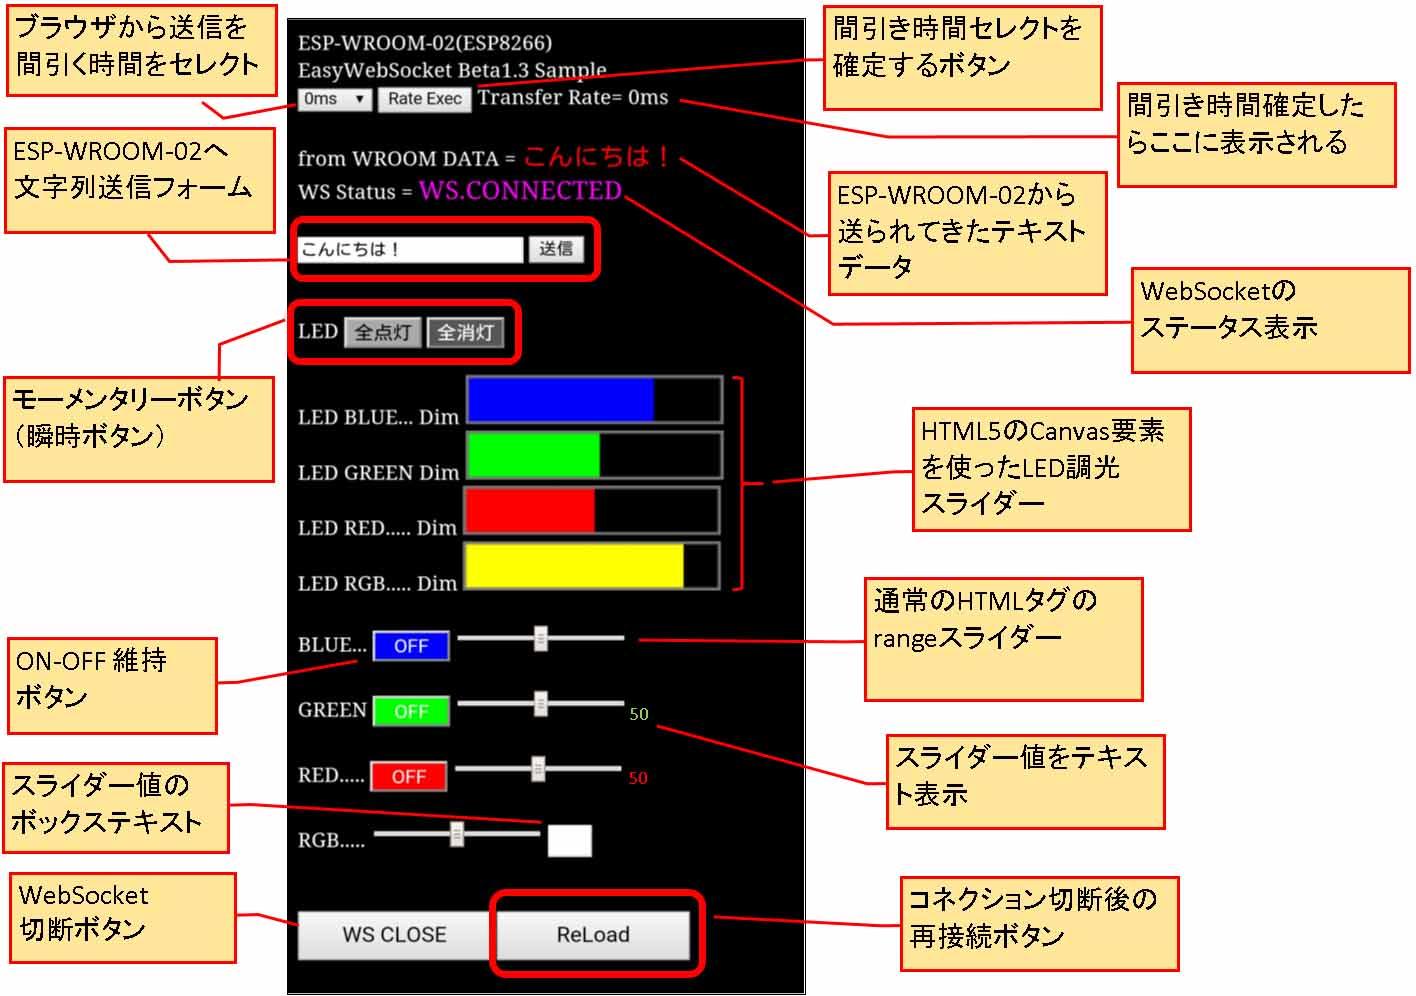 ews_beta13_10.jpg